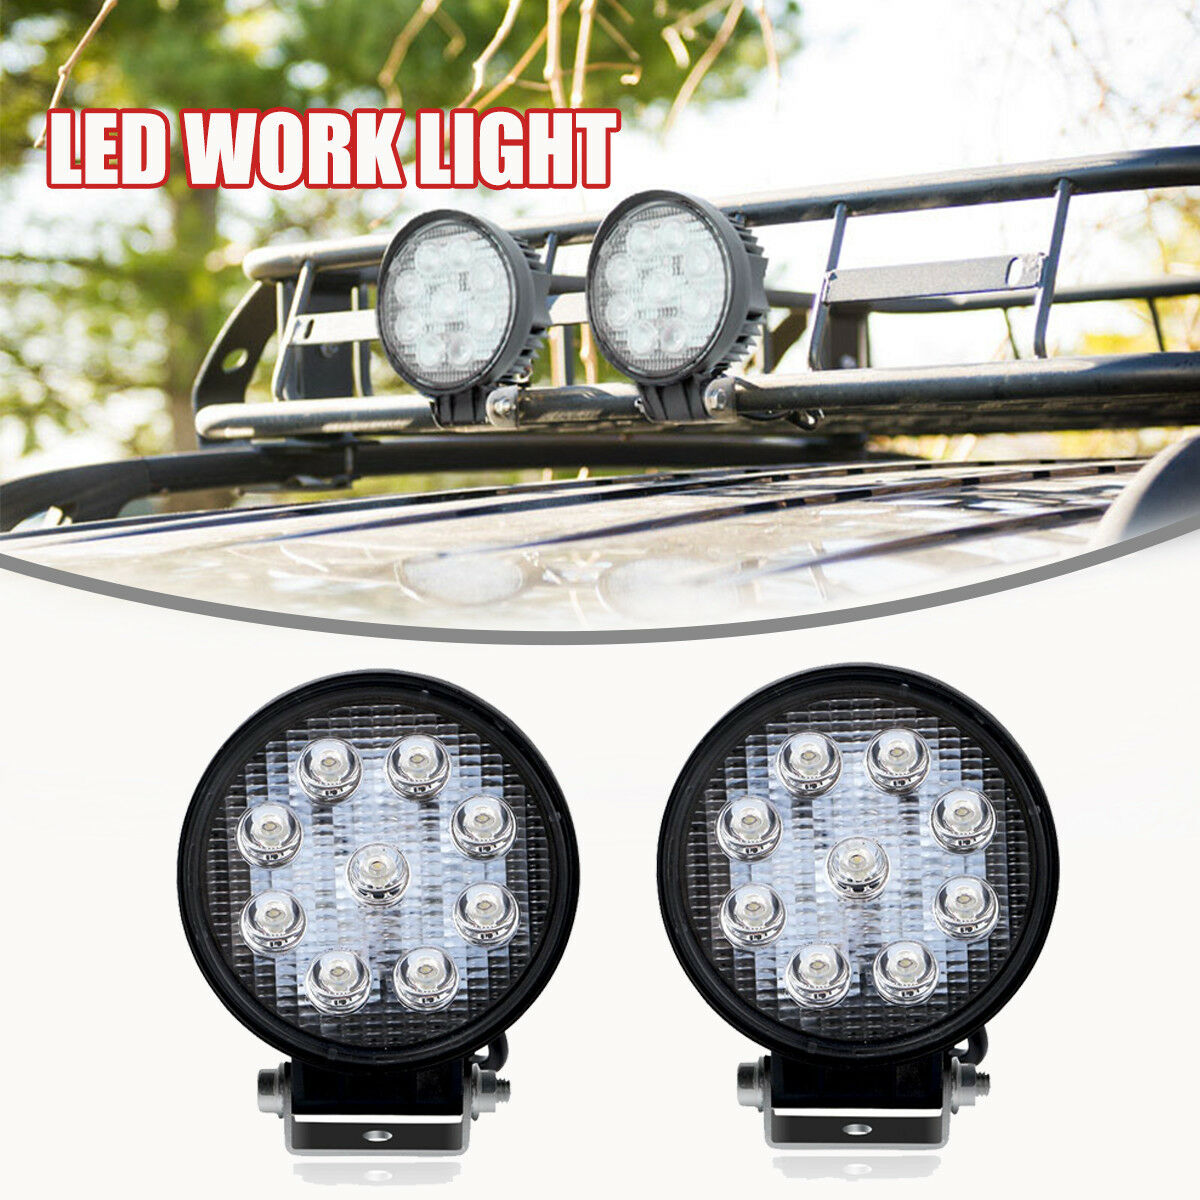 2X 4INCH 18W CREE LED WORK LIGHT BAR DRIVING SPOT BEAM SUV ATV UTE JEEP TRUCK